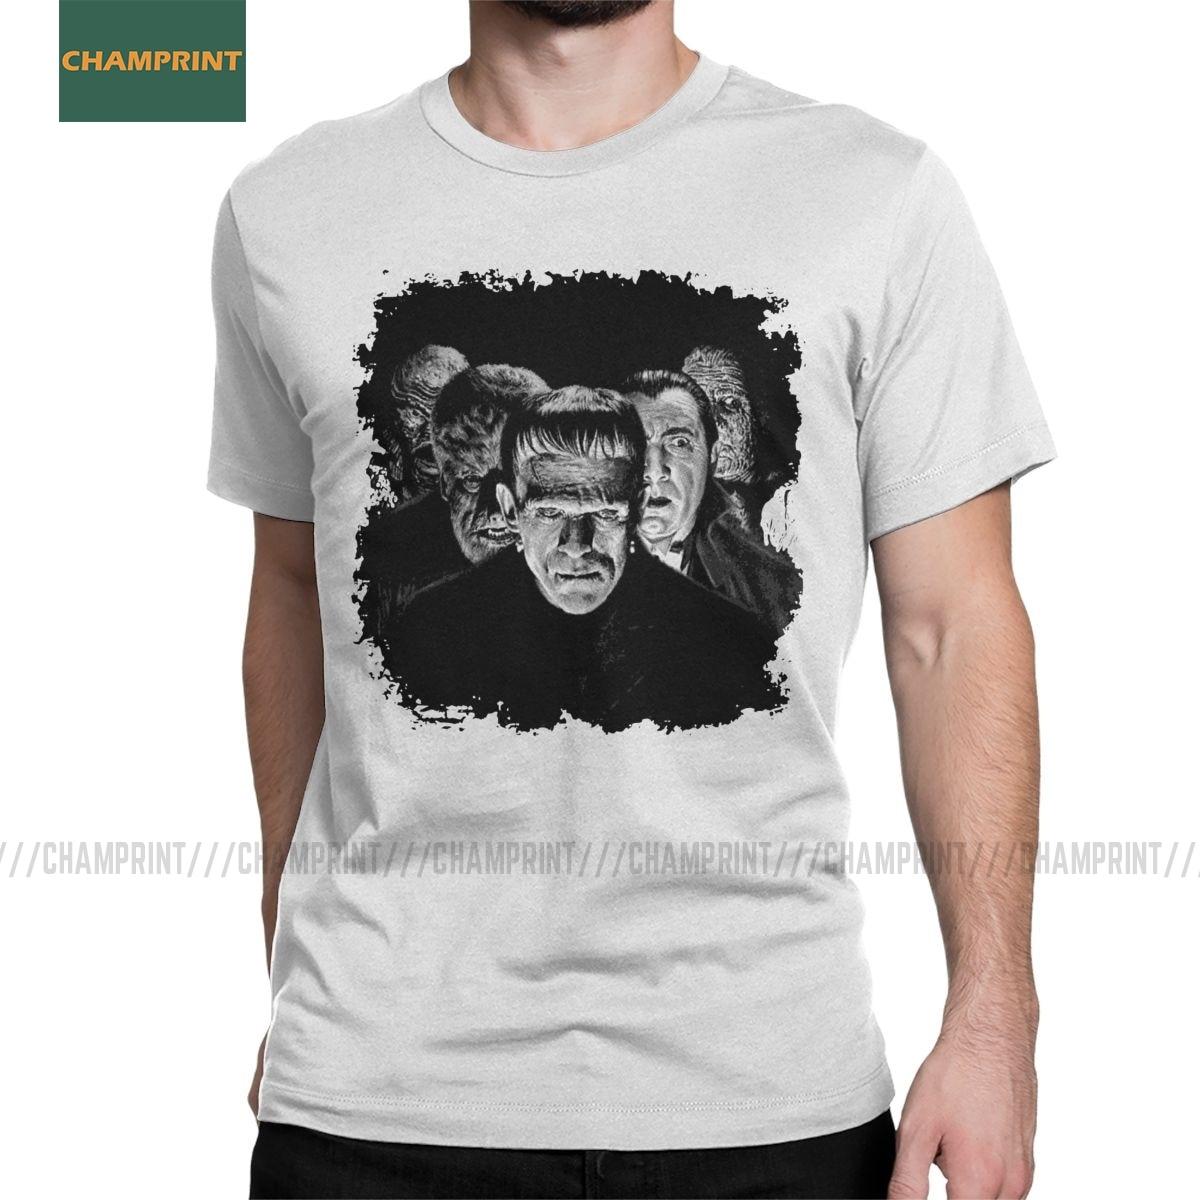 Clásicos monstruos Pop Frankenstein camisetas para hombres monstruo Karloff Drácula Horror algodón camisetas de manga corta Camiseta clásica Tops